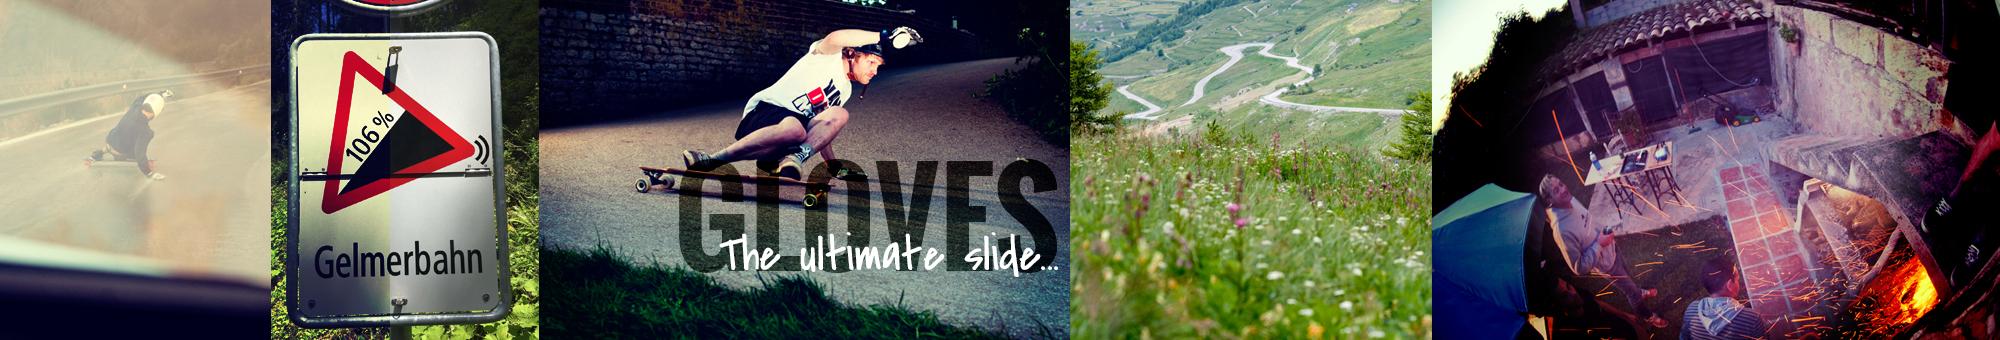 Image: Freeride Gloves